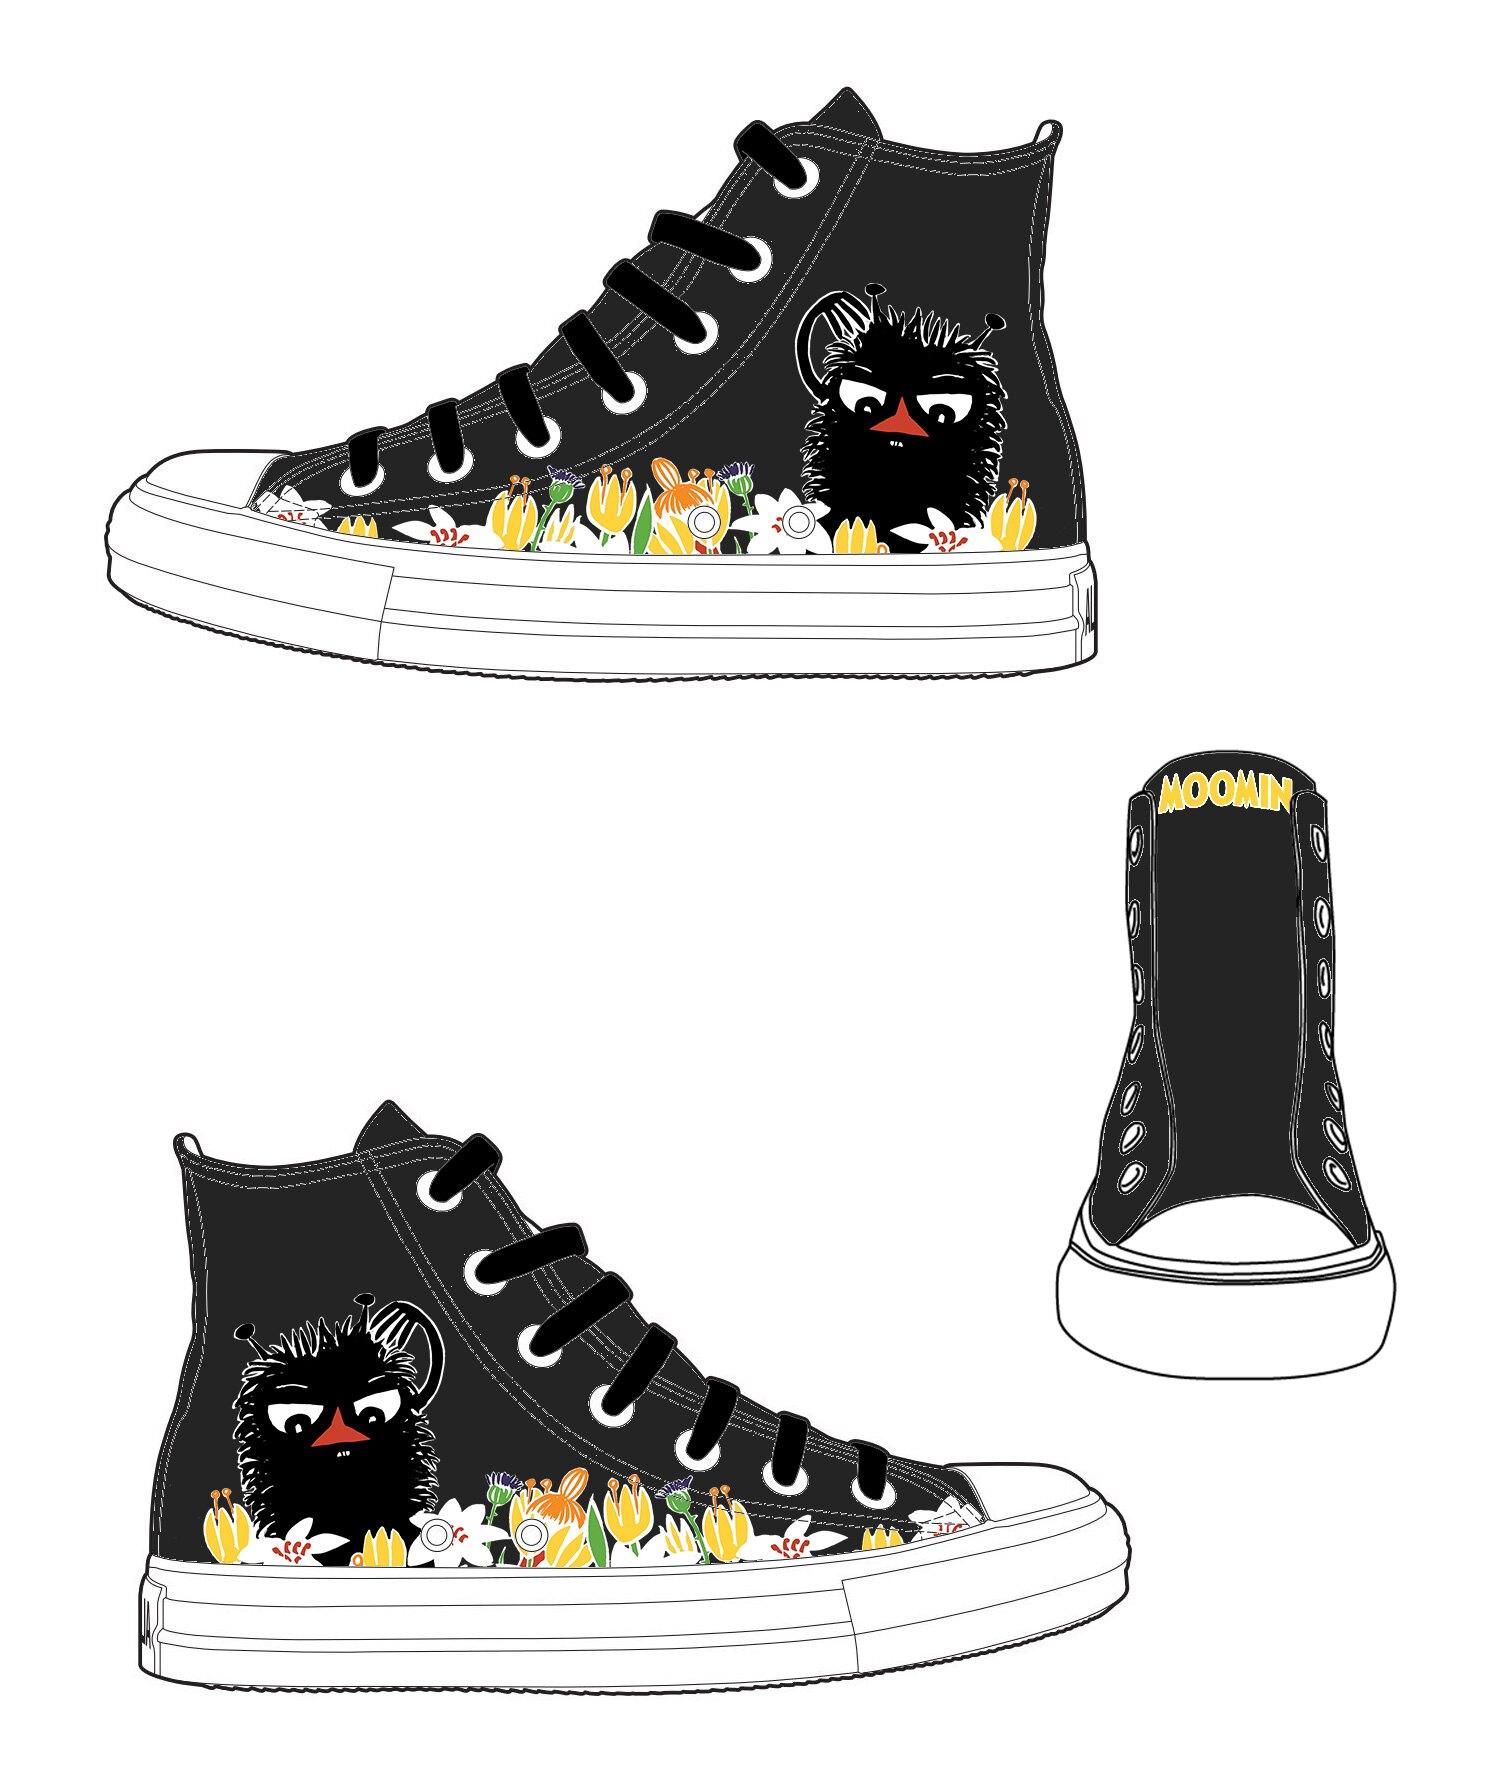 【Moomin】AE17 (黑鞋黑帶) - 帆布鞋 (男/女)